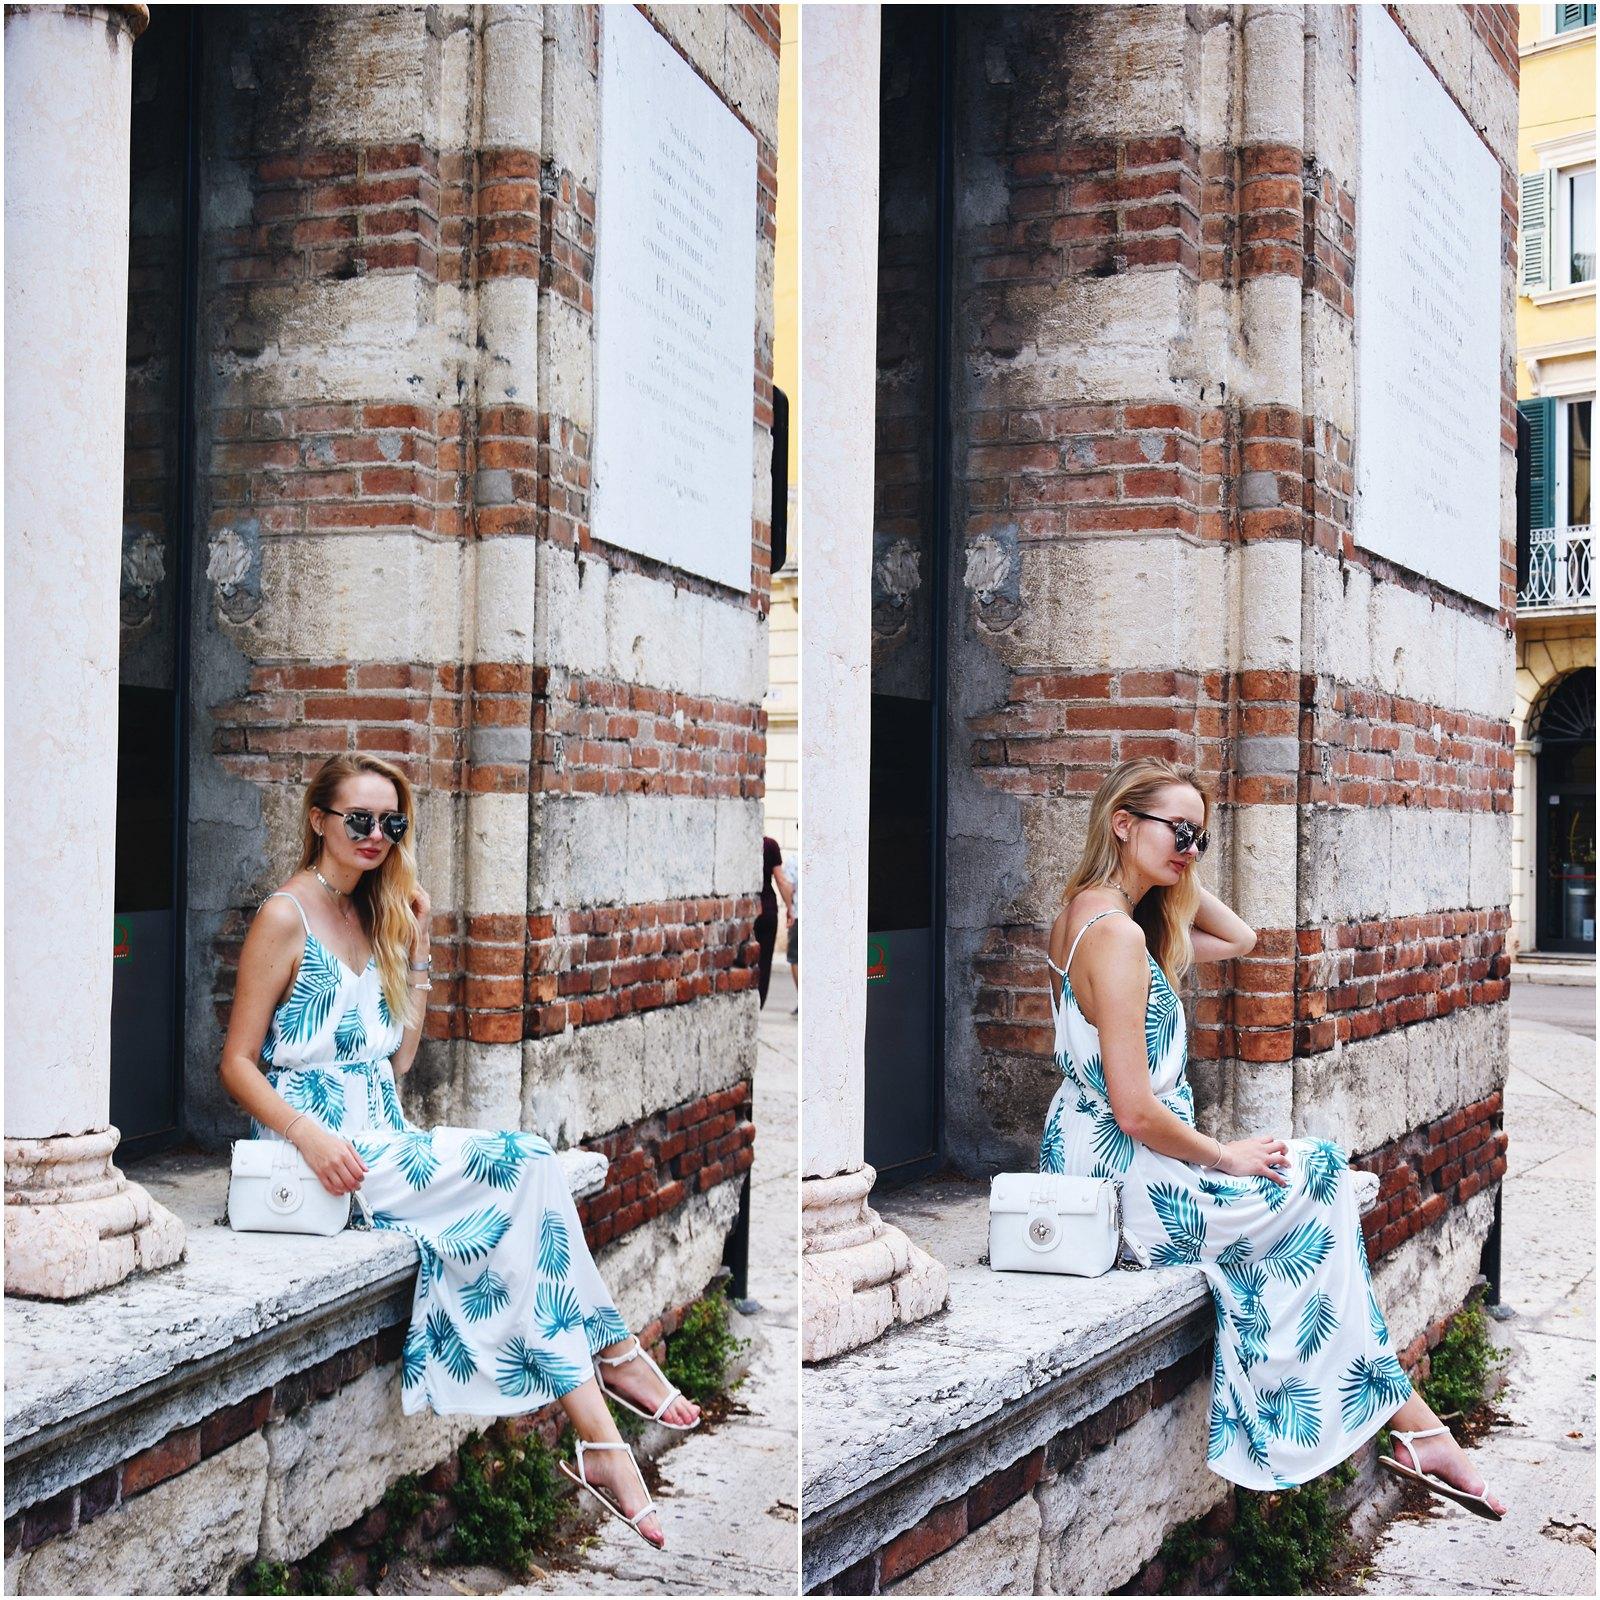 Verona outfit inspiration